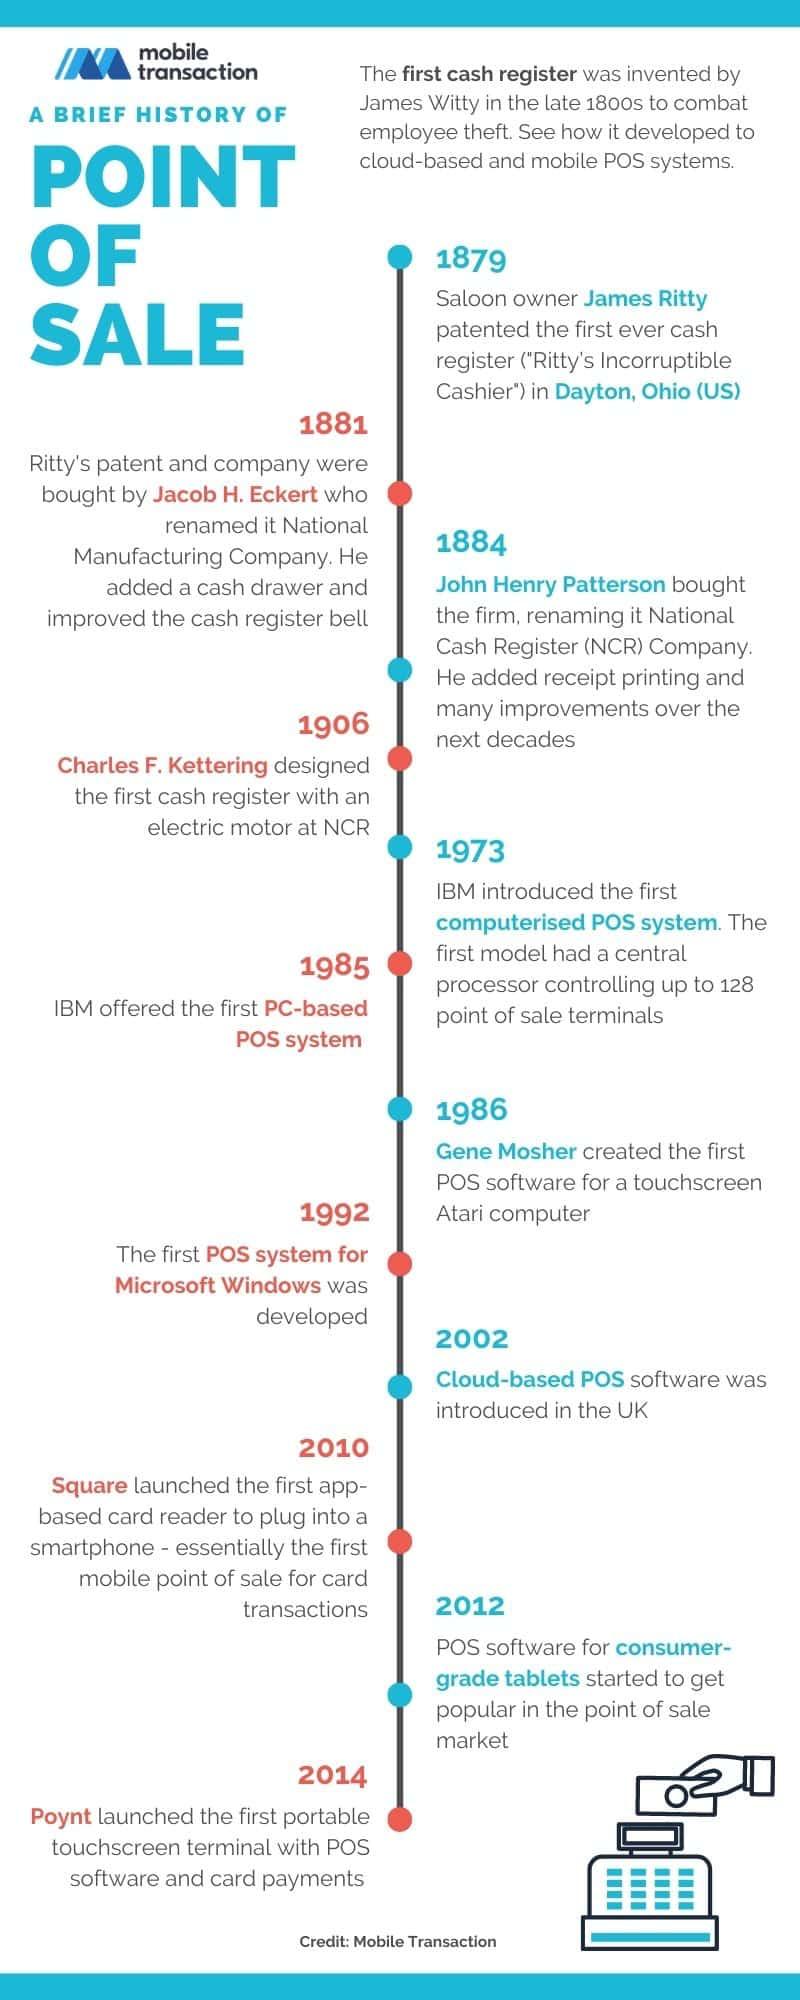 POS history timeline